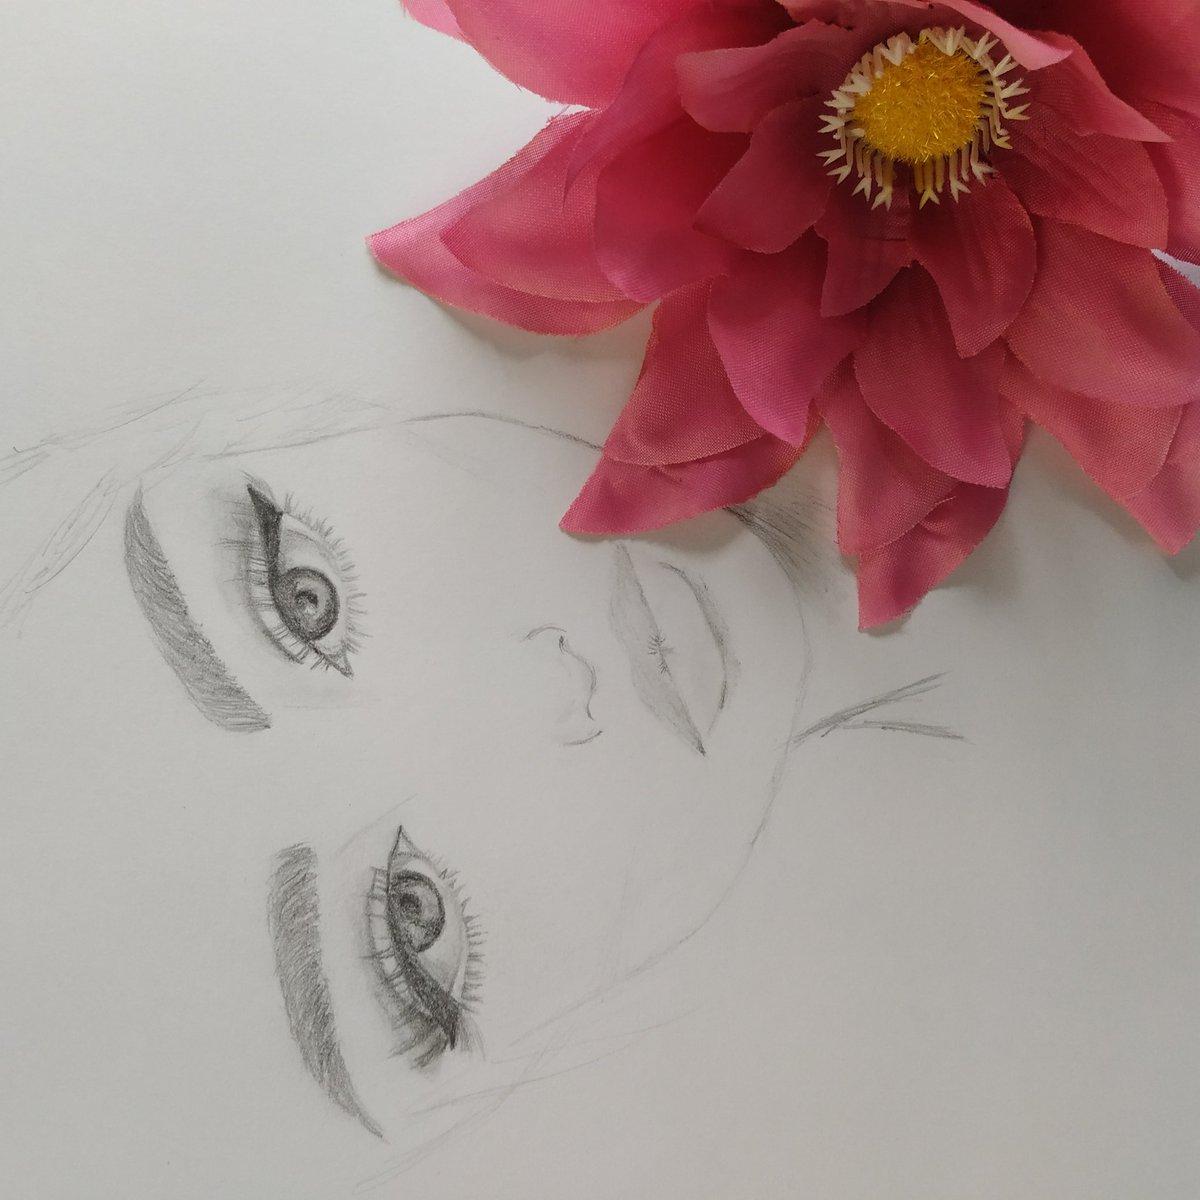 Buenos y floreados días.    #arte #dibujo #pintura #pincel #amarillo #girasol #art #painting #artist  #drawing #yellow #sunflower #brush #paintbrush # #girl #chica #lapiz #carboncillo #eyes #ojos #lips #labios #eyelinerpic.twitter.com/ocAB2Mlvdd